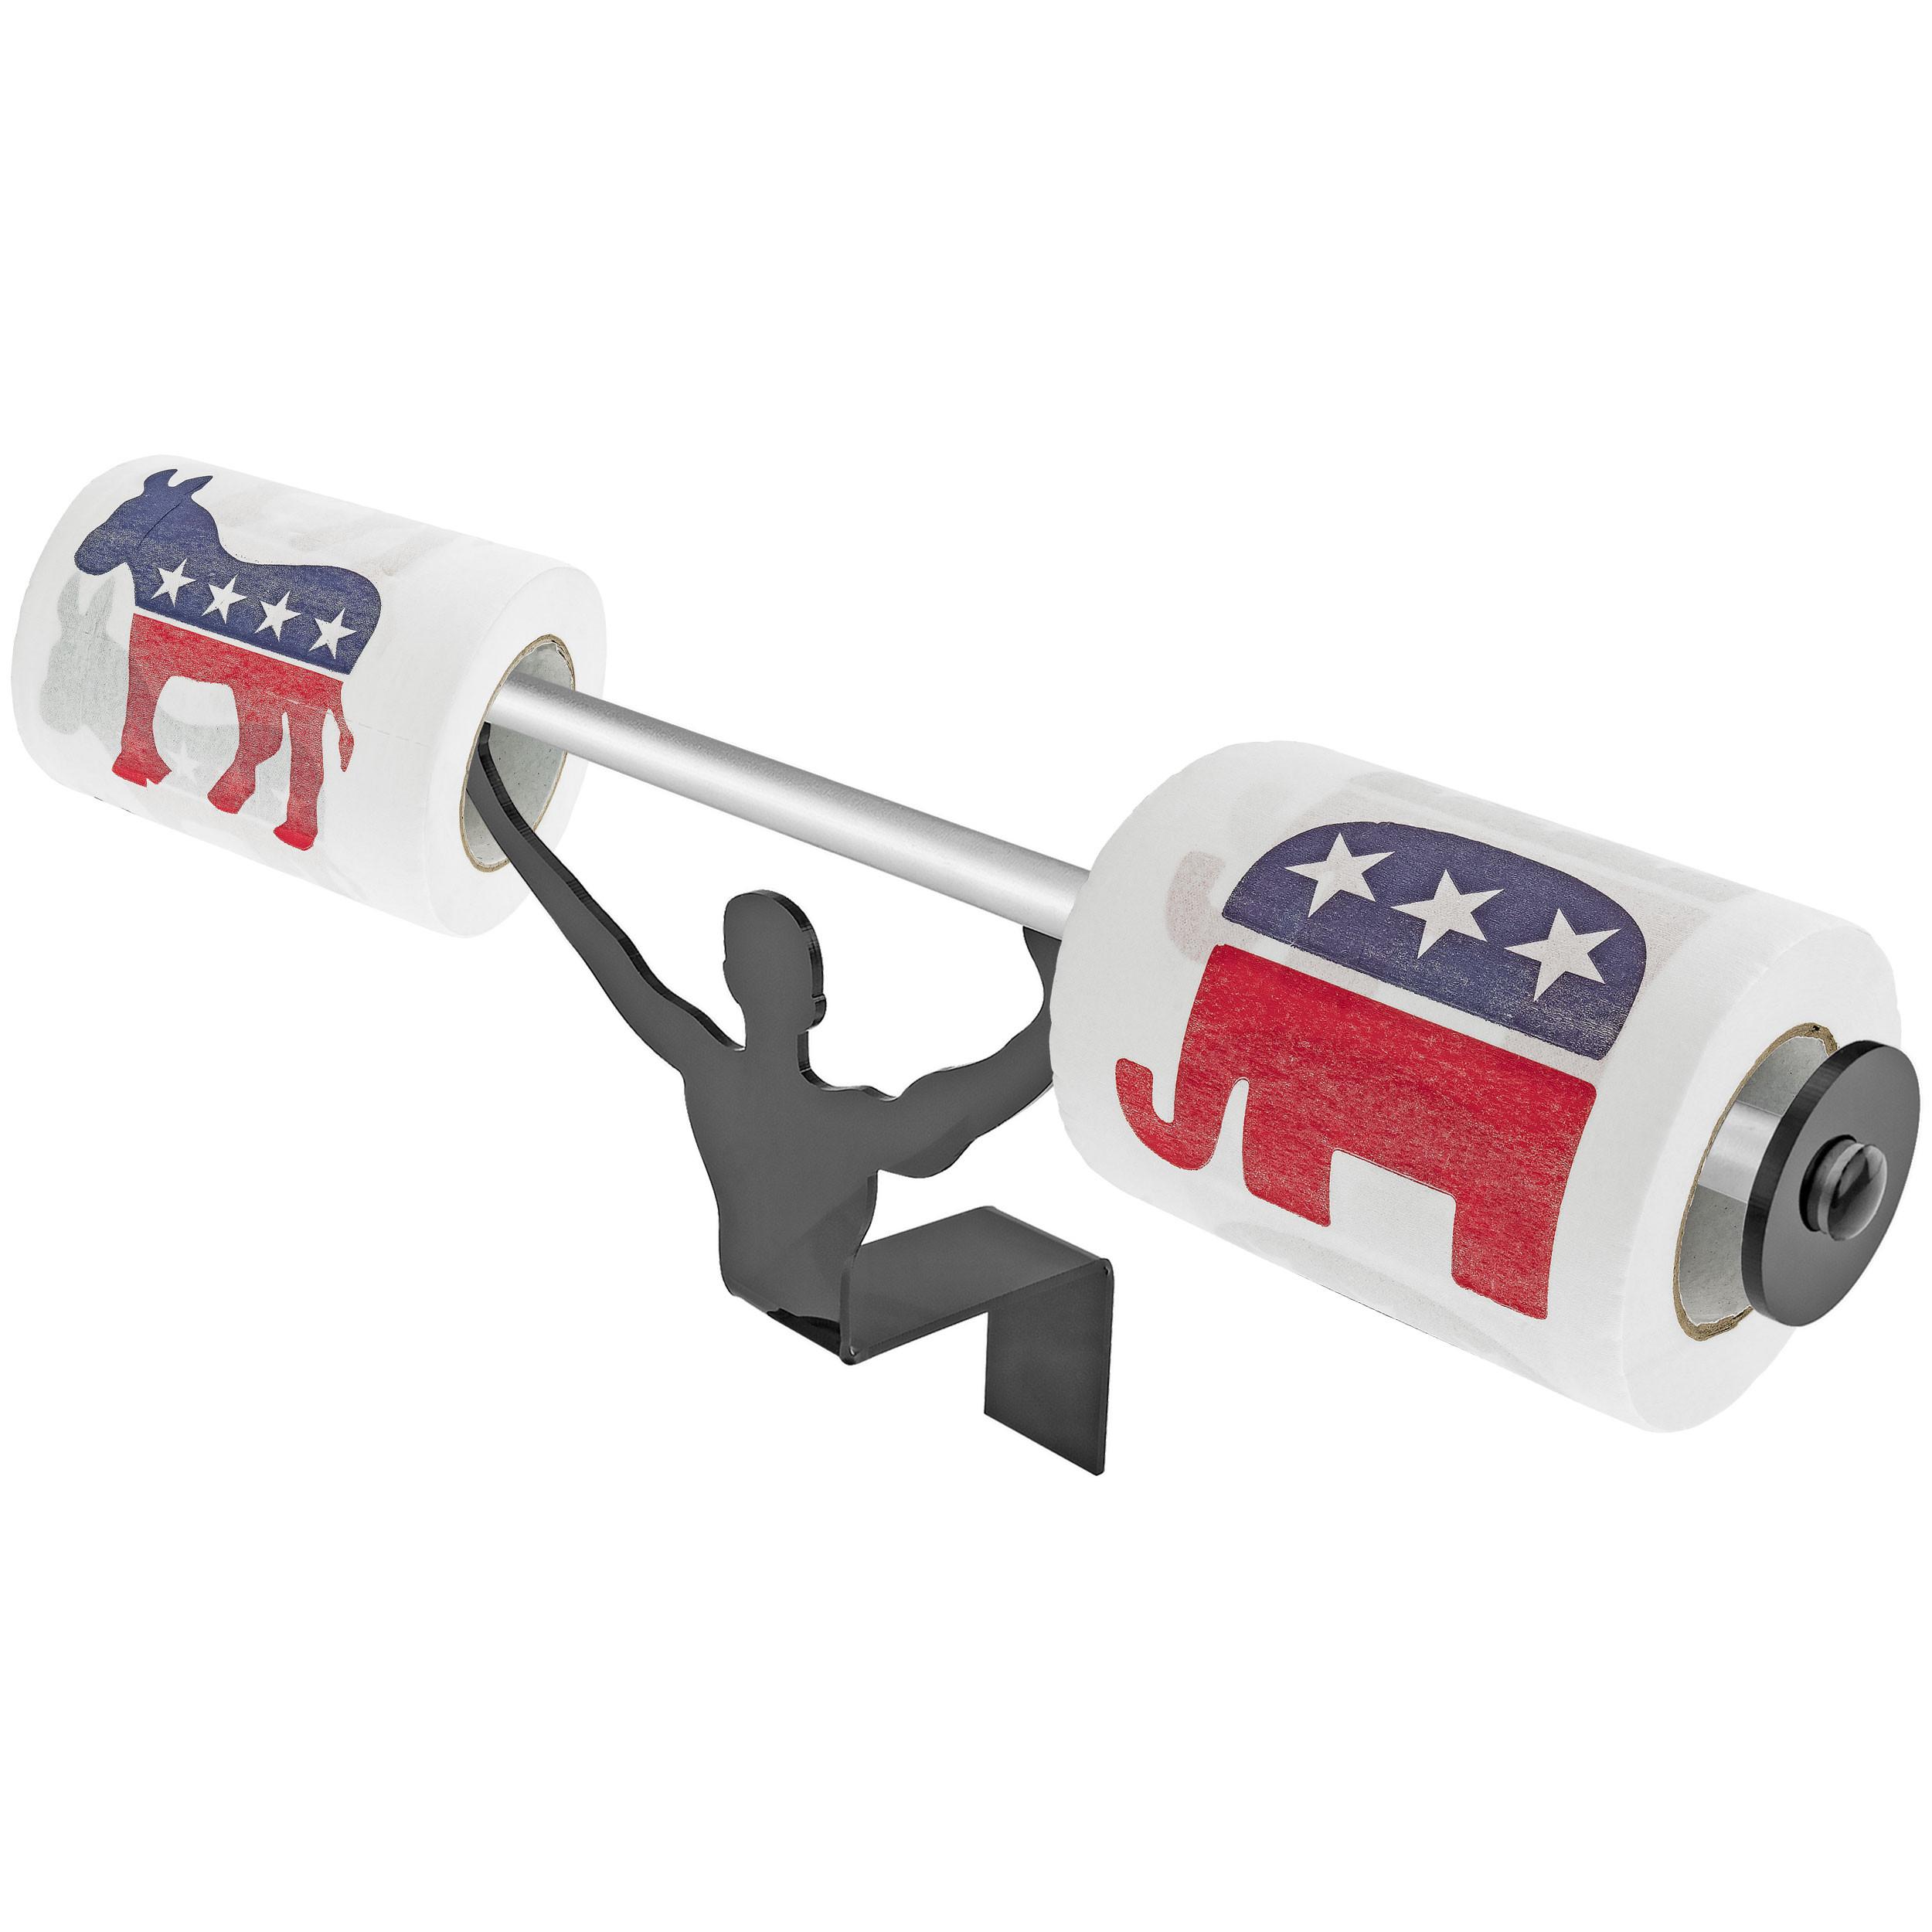 Fairly Odd Novelties Republican & Democrat Logos Novelty Toilet Paper w/Strong Man Holder Funny Politics Gift Set